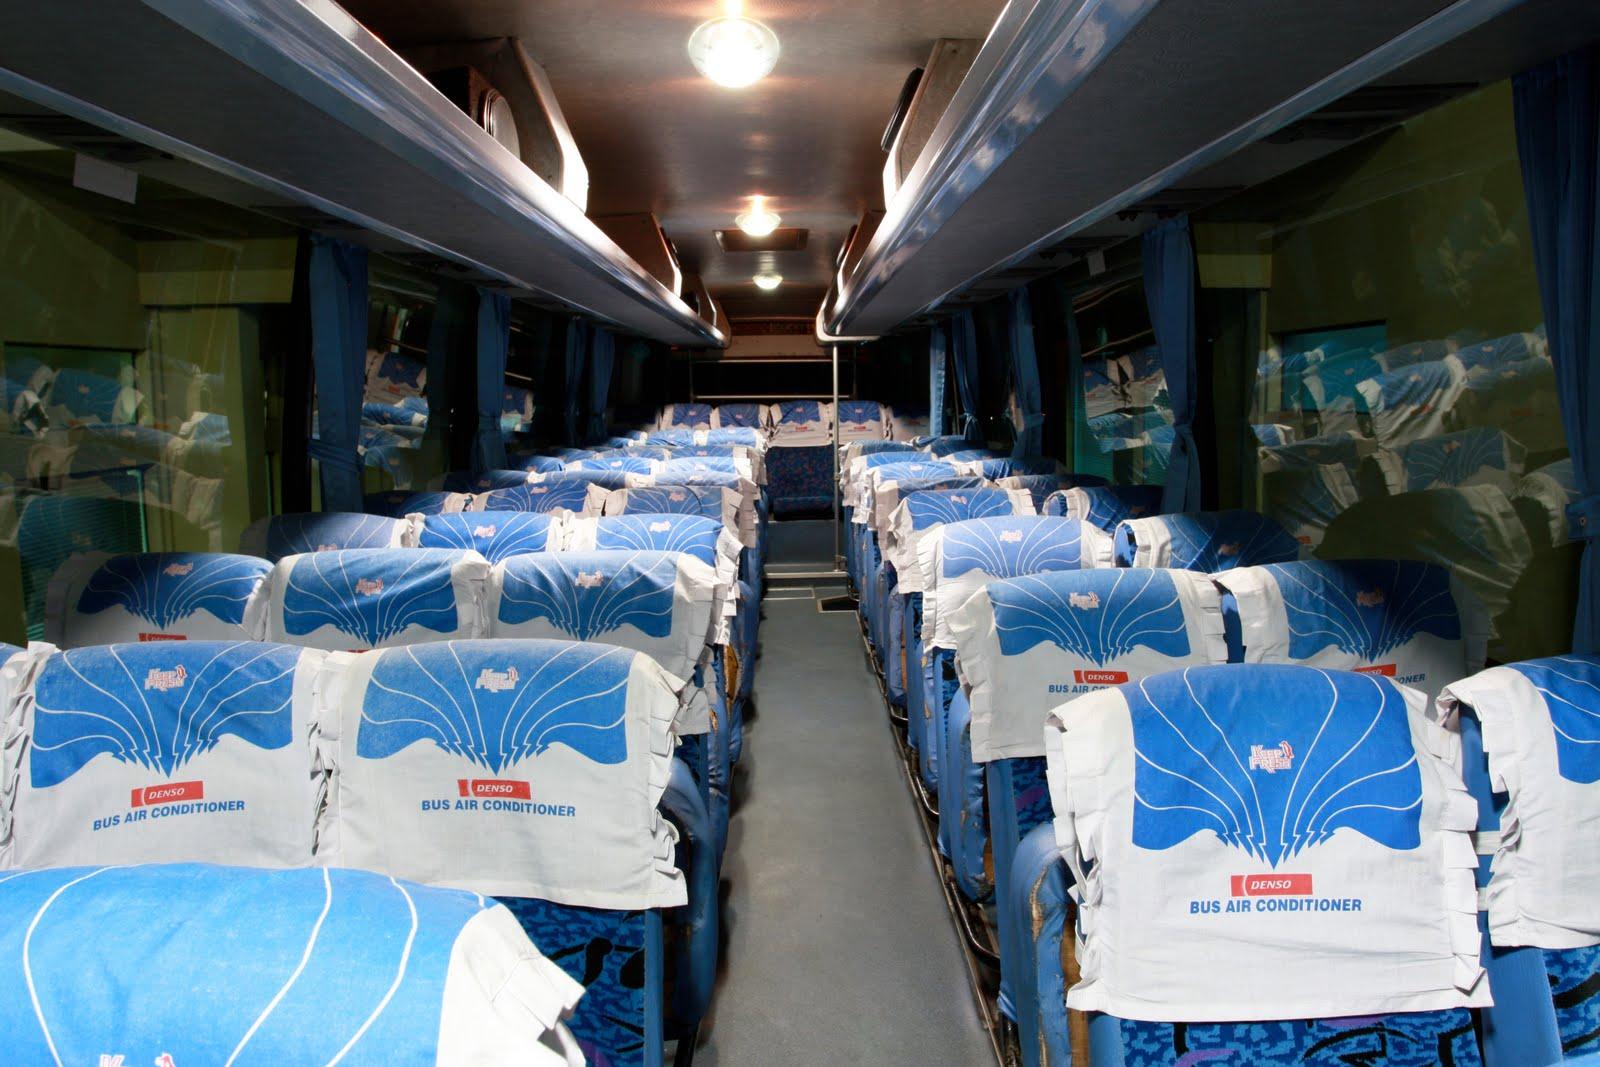 Tempat Duduk - Bus Eksekutif vs Kereta Eksekutif, Pilih Mana?